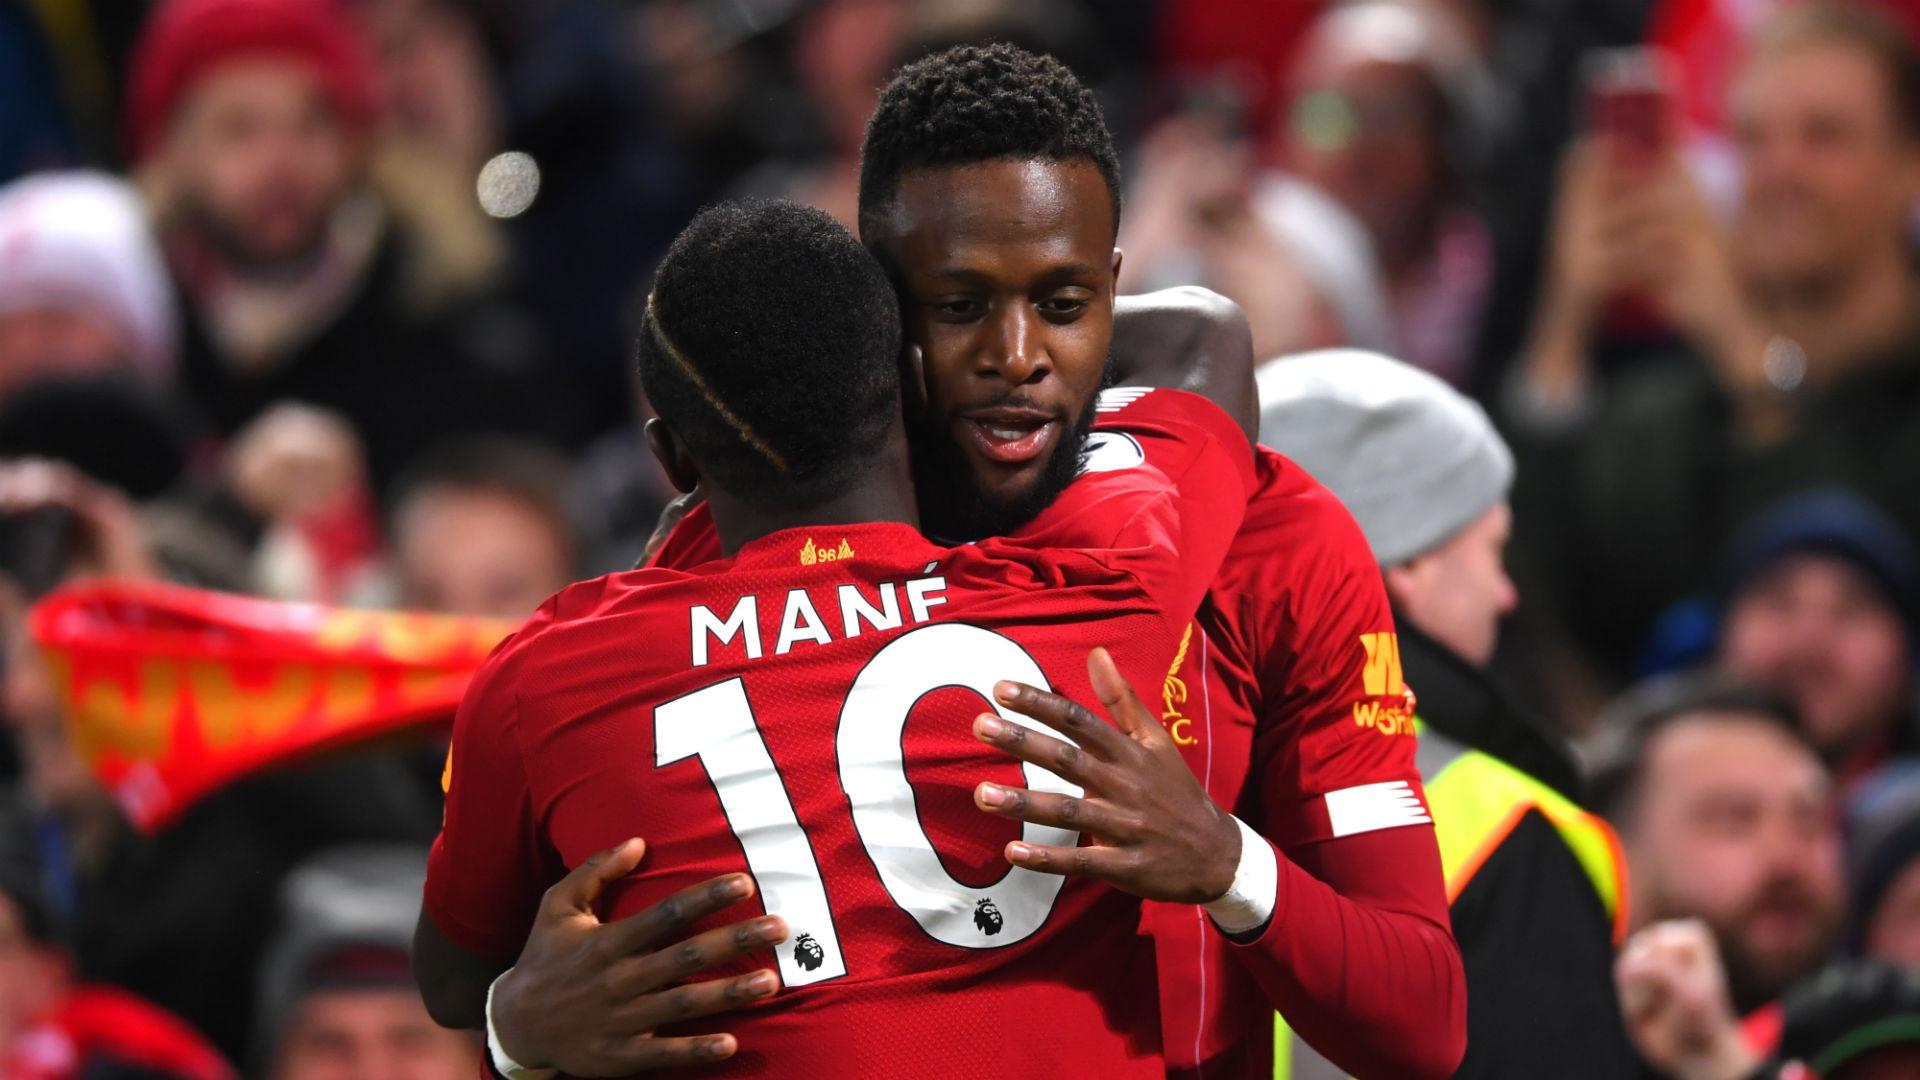 Liverpool set longest unbeaten streak as Klopp becomes second-fastest to 100 PL wins